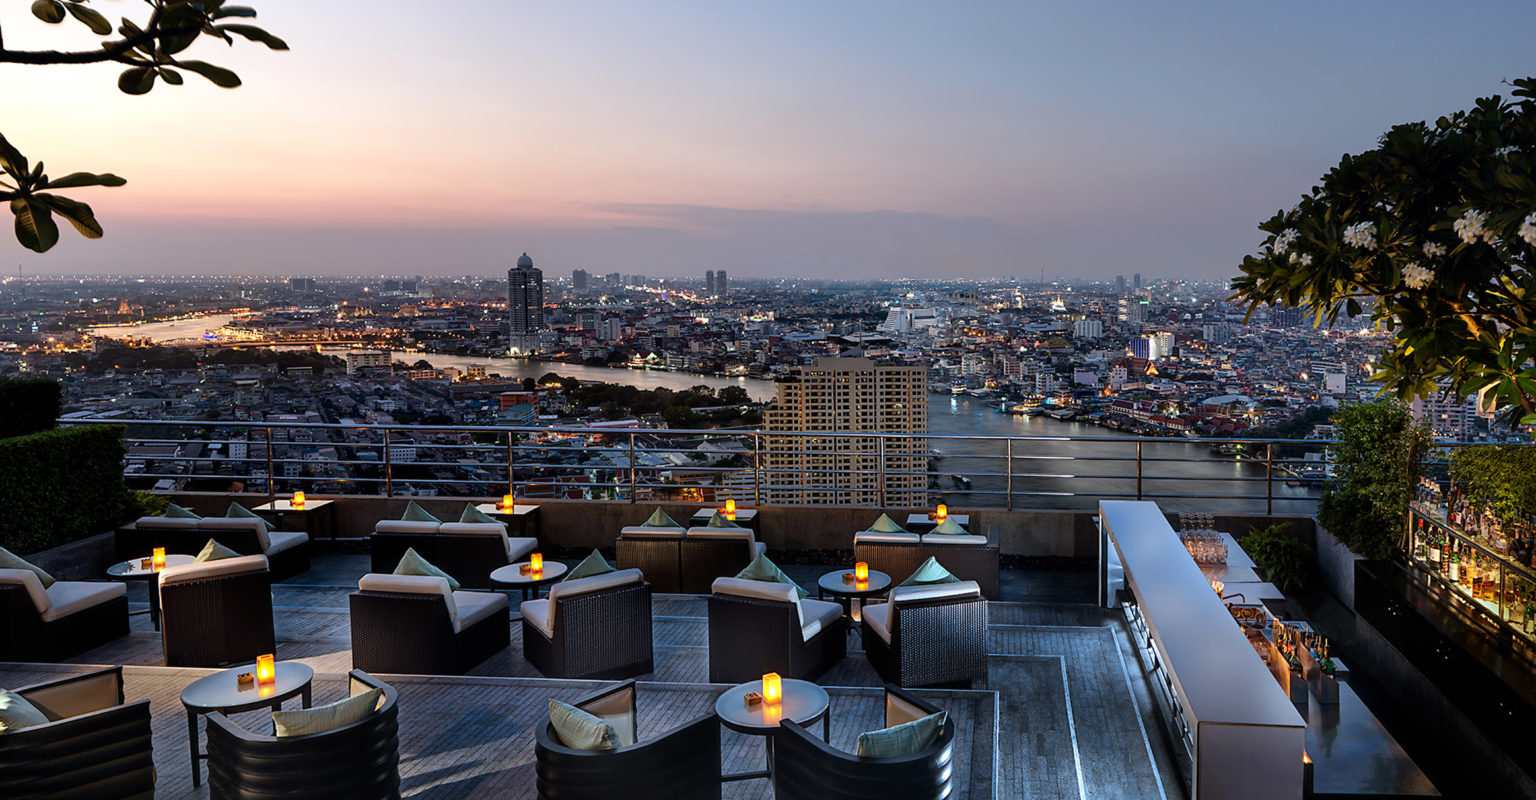 Three Sixty Lounge of the Millennium Hilton Bangkok overlooking the Bangkok River